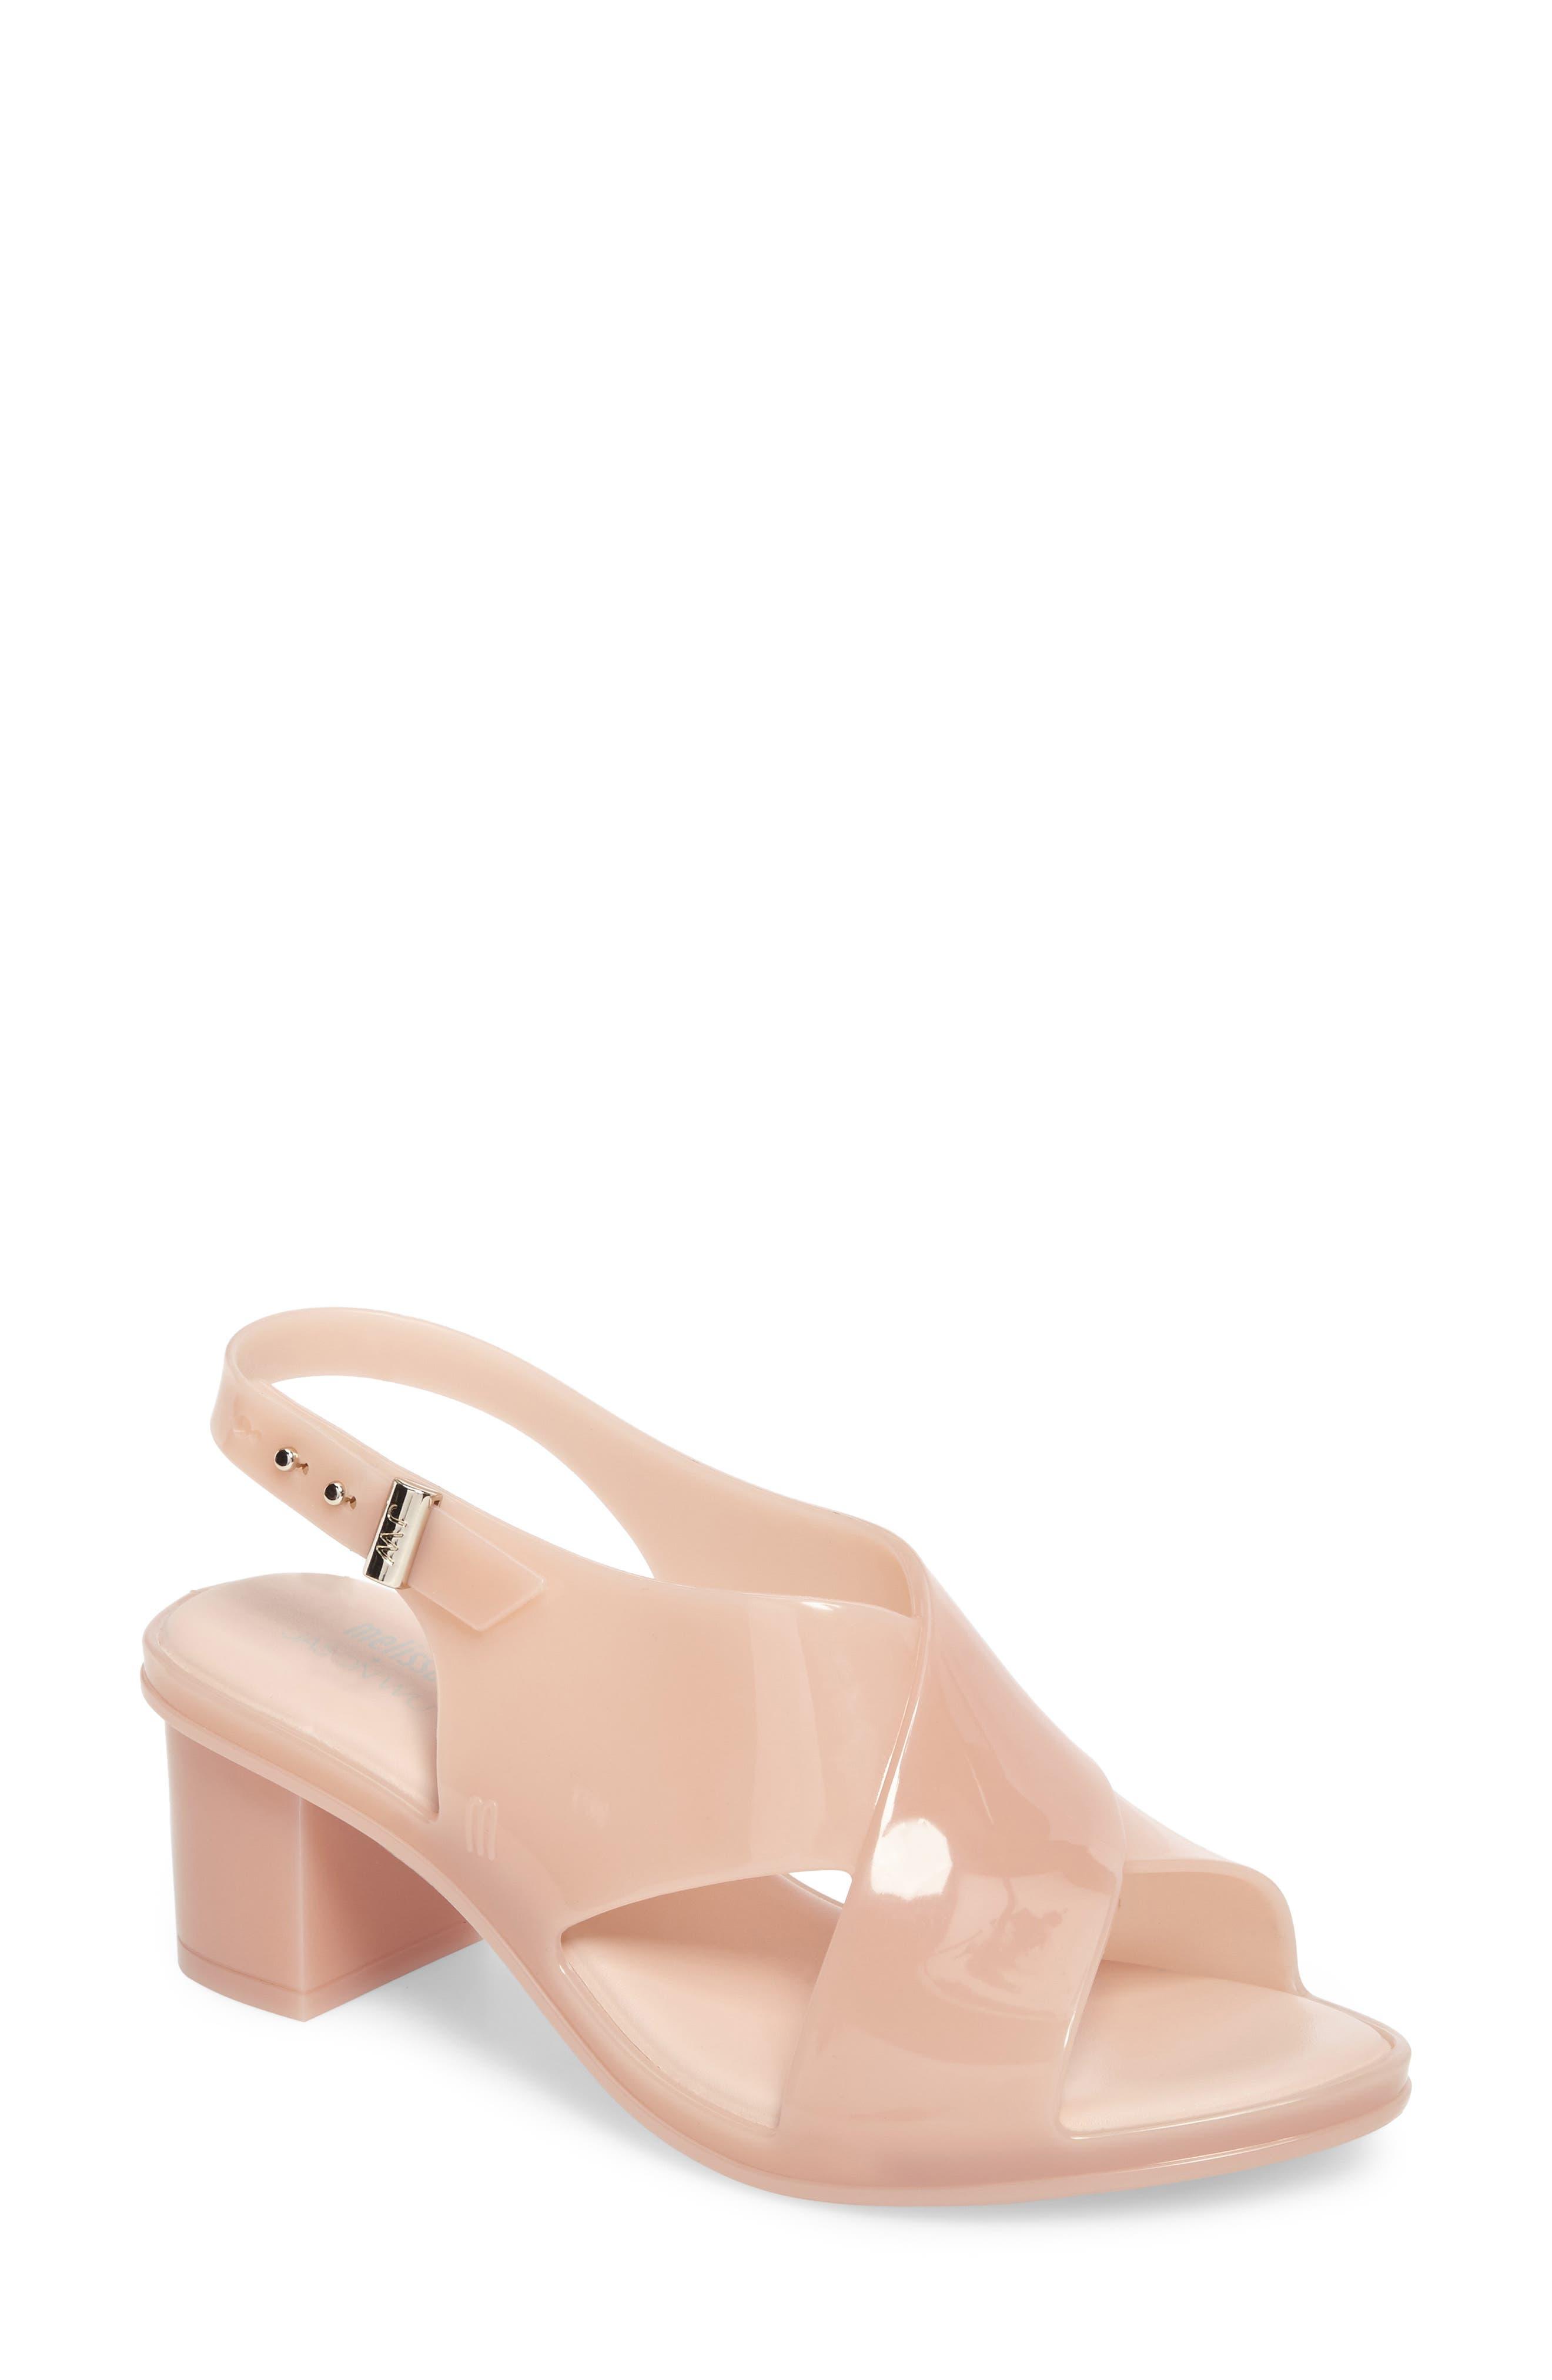 x Jason Wu Jamie Cross Strap Slingback Sandal,                             Main thumbnail 1, color,                             Light Pink Matte